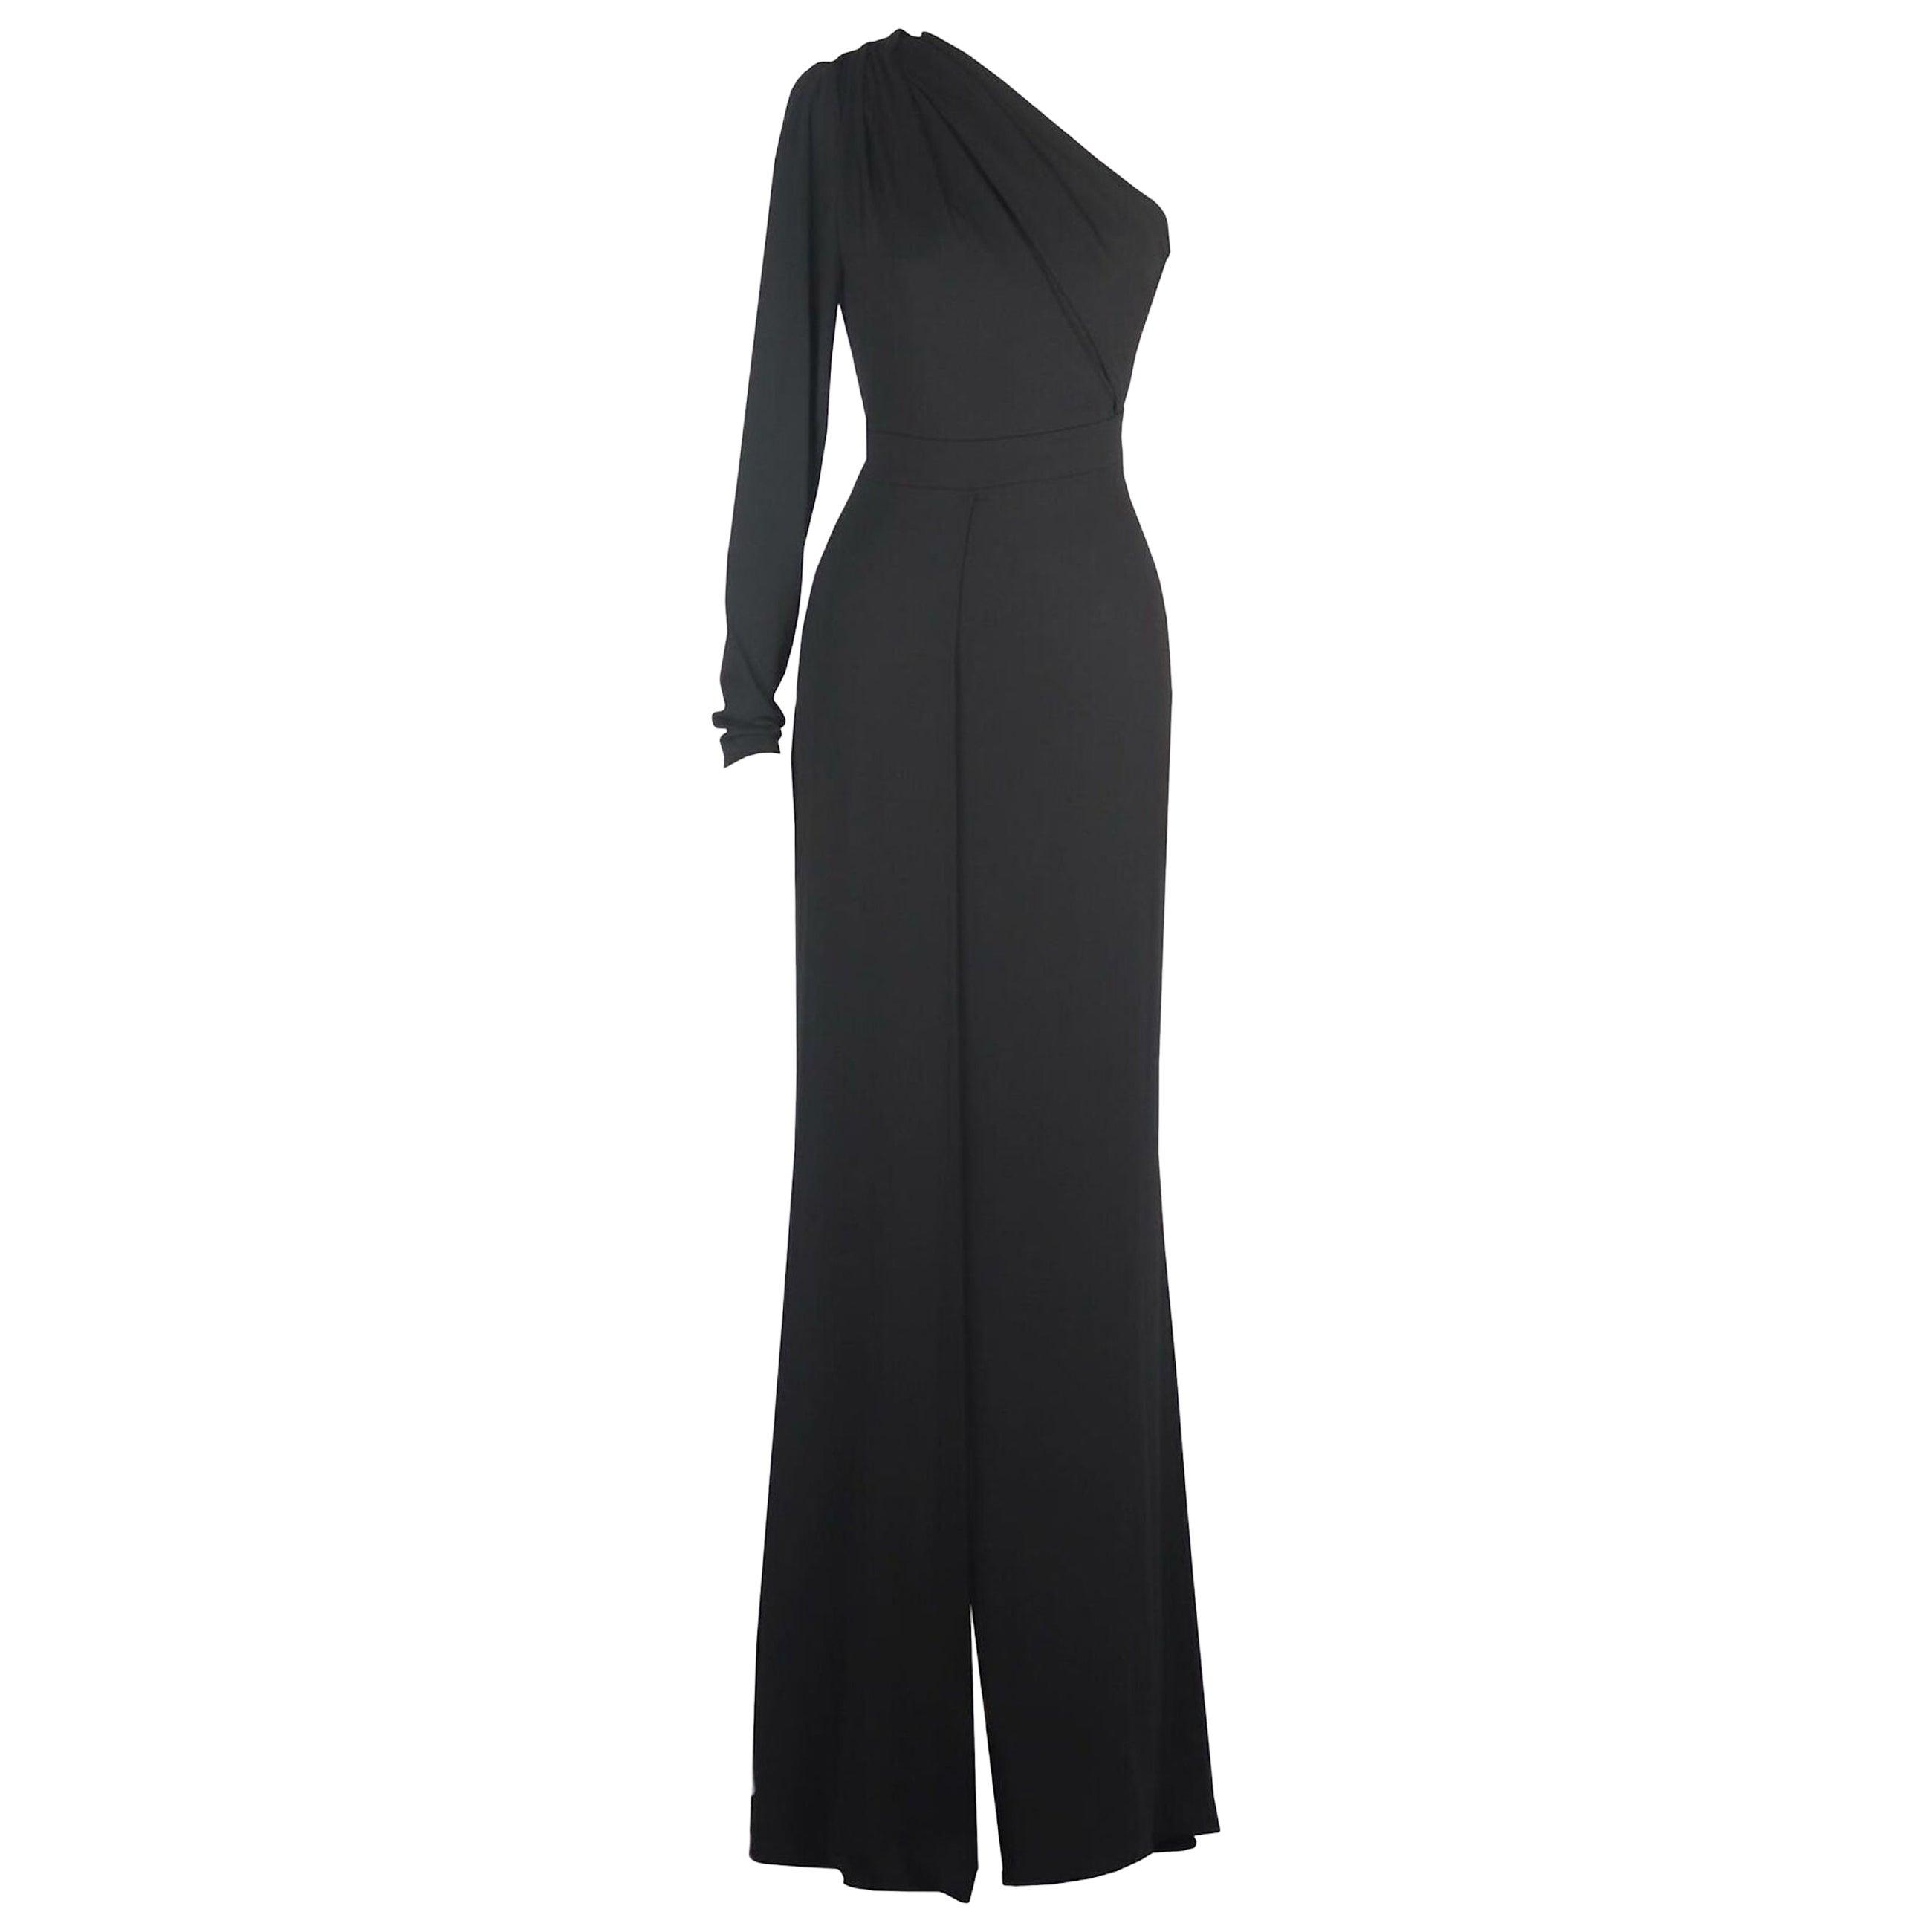 Elie Saab One Shoulder Stretch Jersey Gown